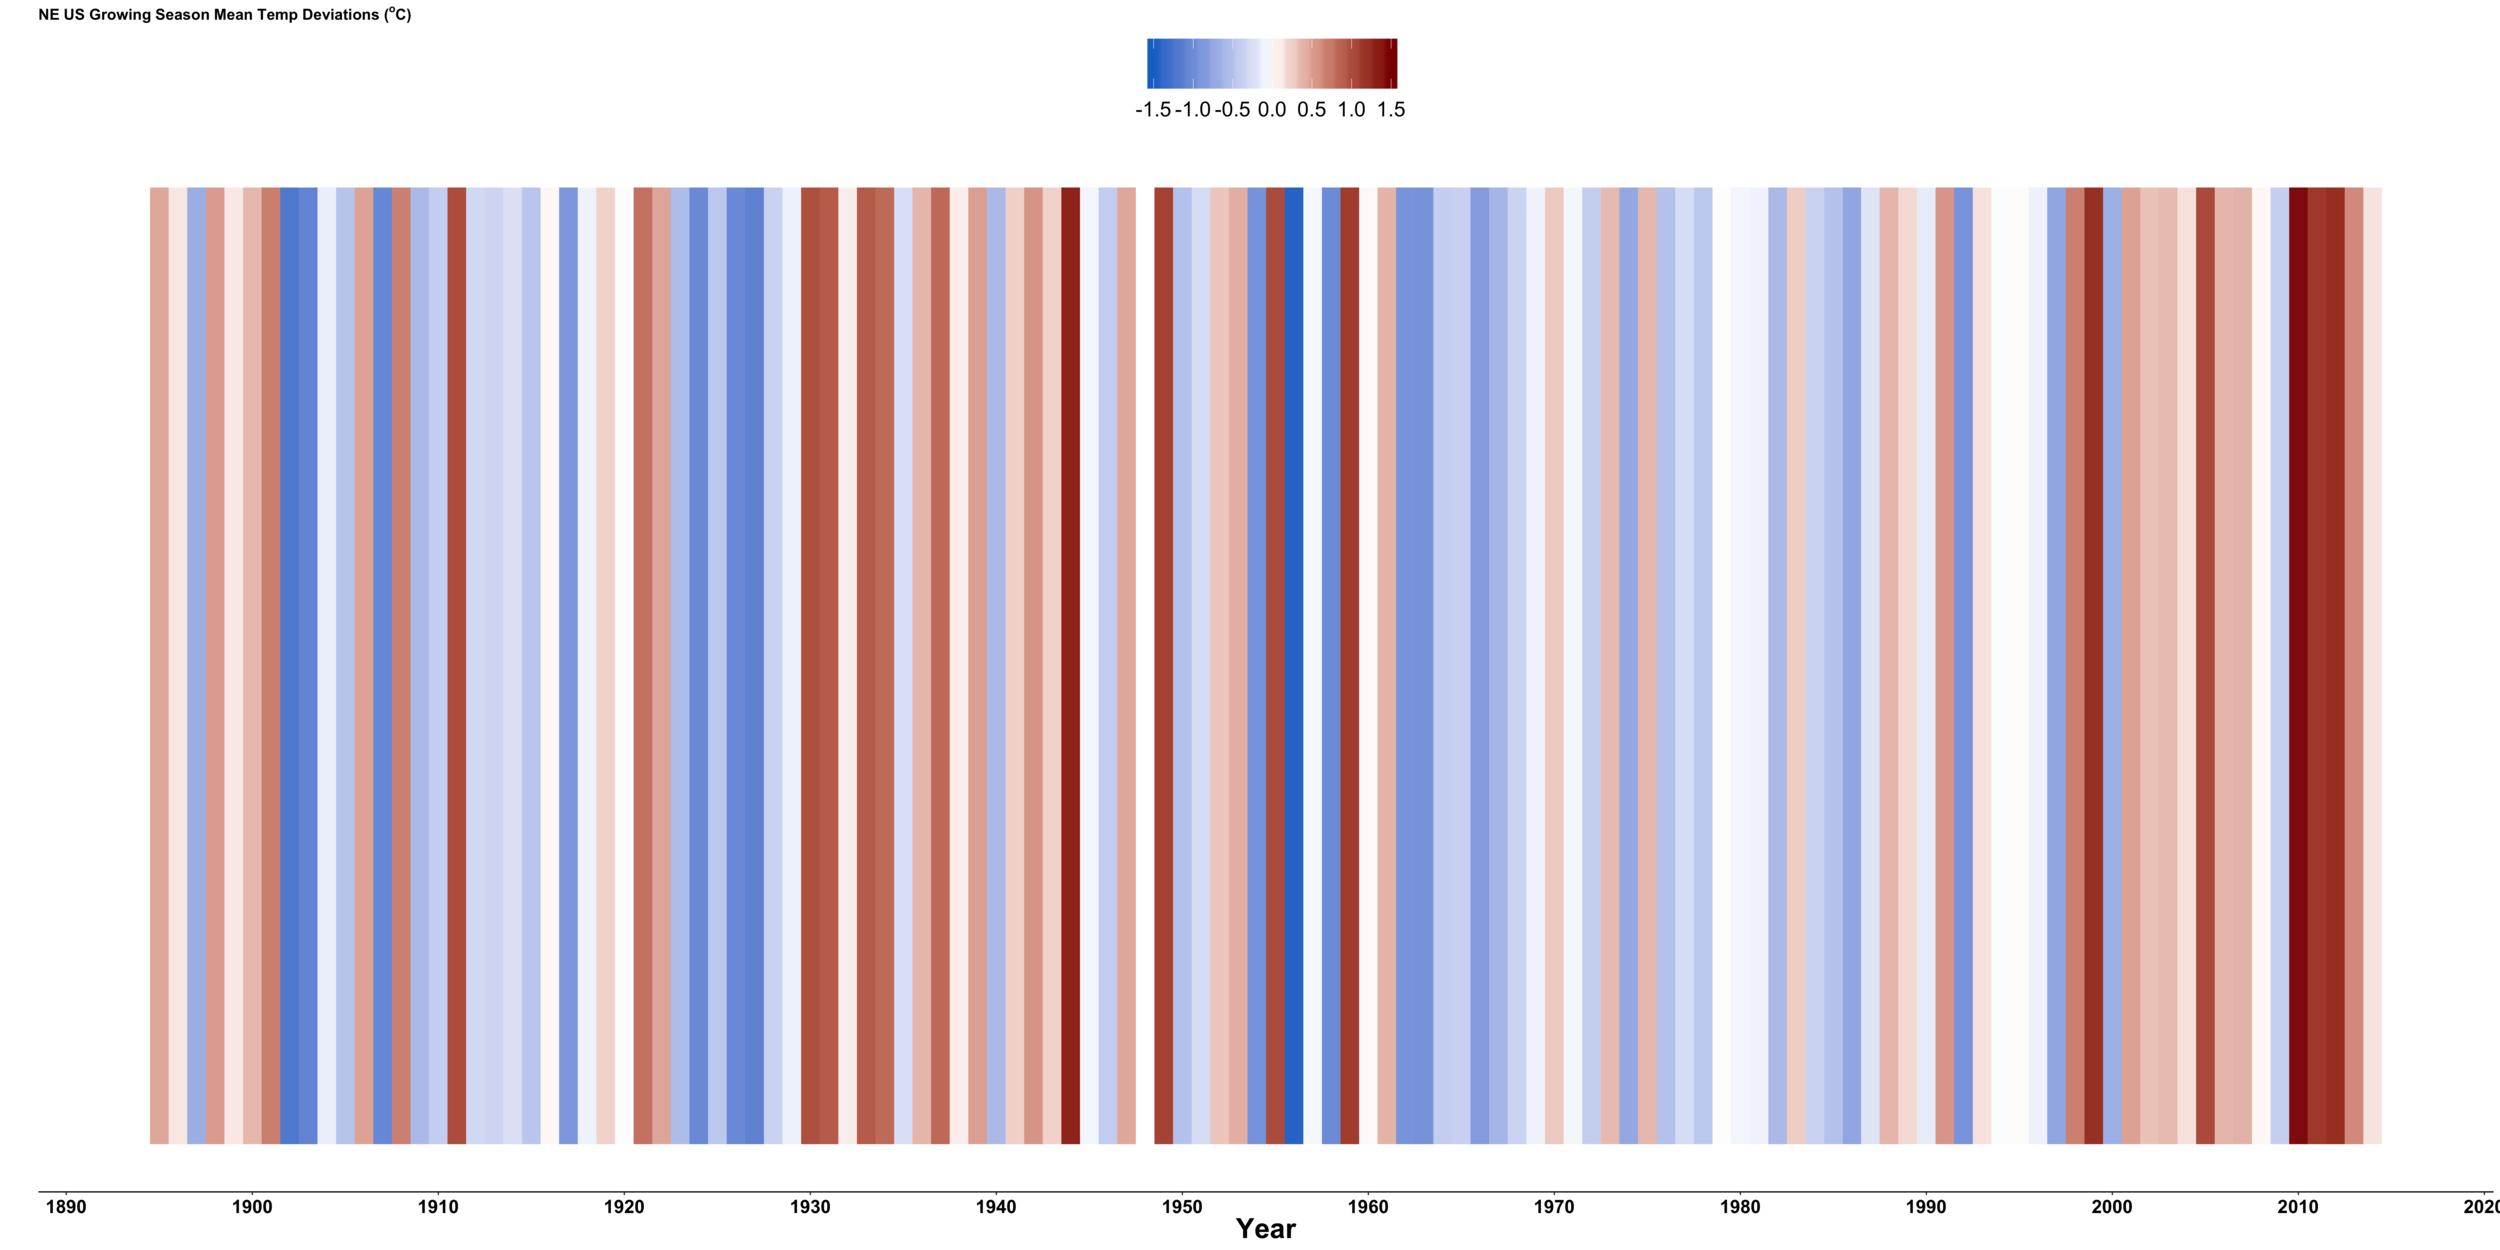 NE U.S. Temperature Stripes